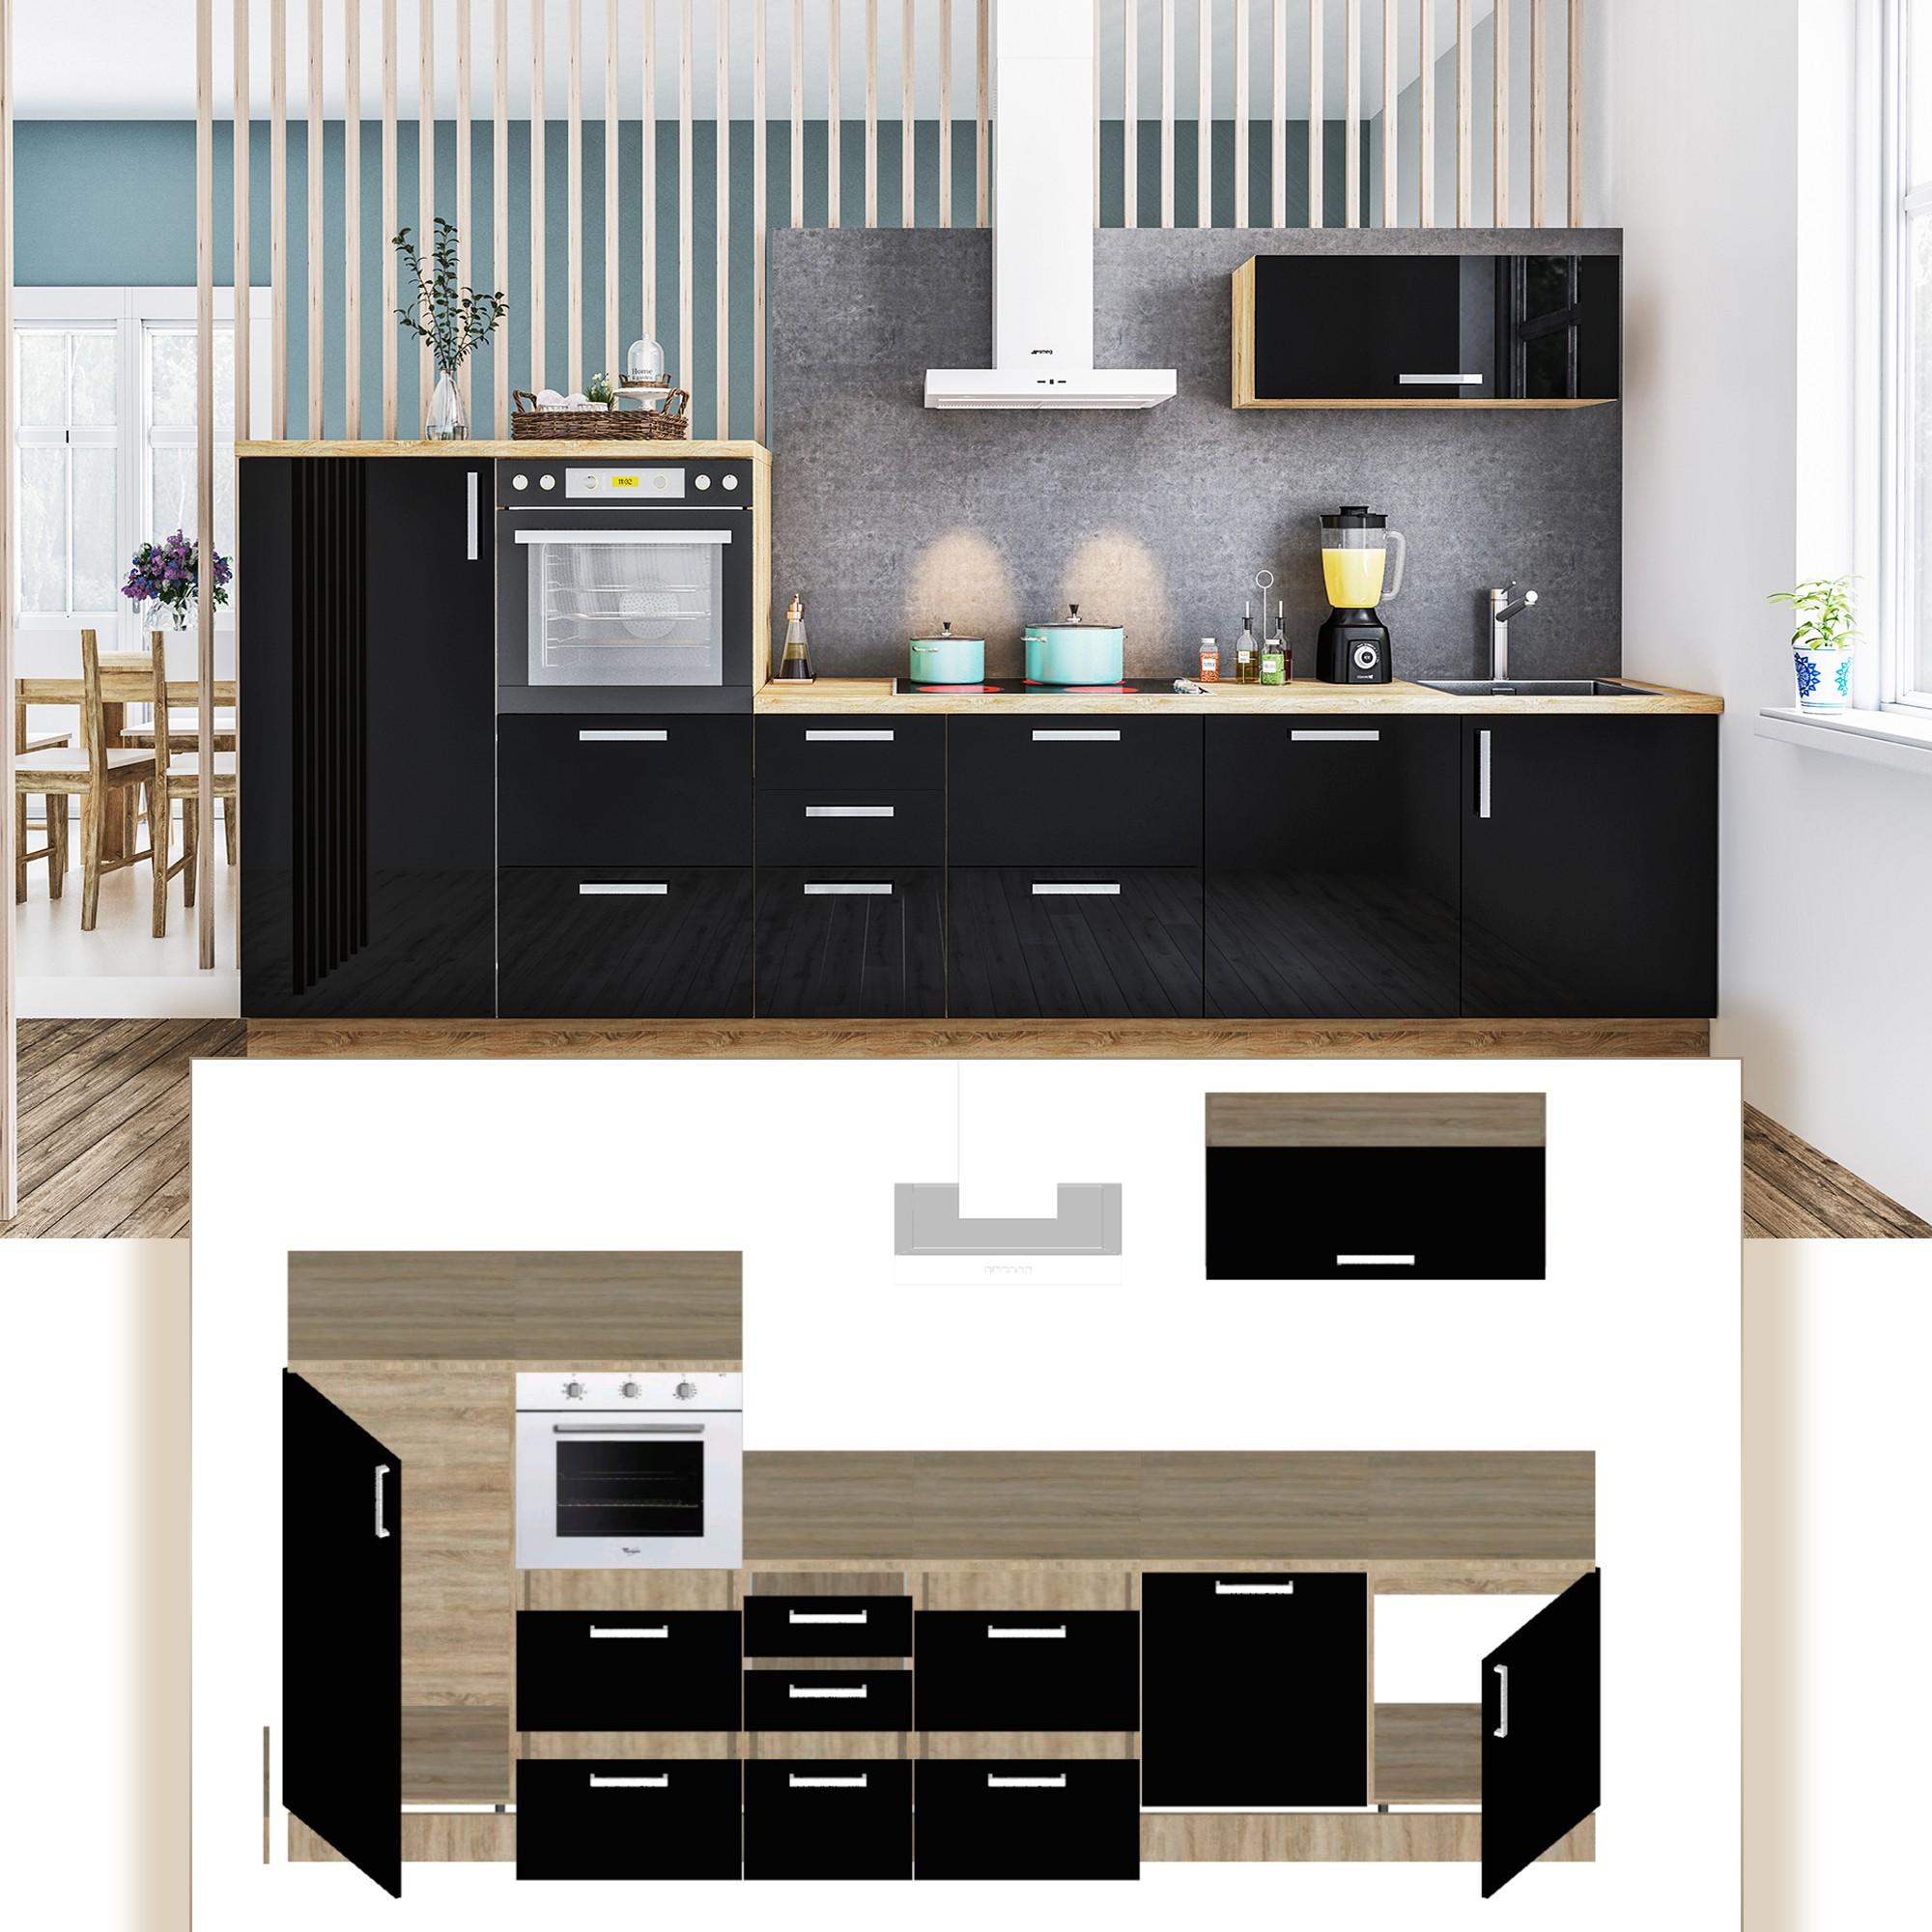 Full Size of Küche Mit Elektrogeräten Billig Küche Mit Elektrogeräten Ebay Küche Mit Elektrogeräten Poco L Küche Mit Elektrogeräten Gebraucht Küche Eckküche Mit Elektrogeräten